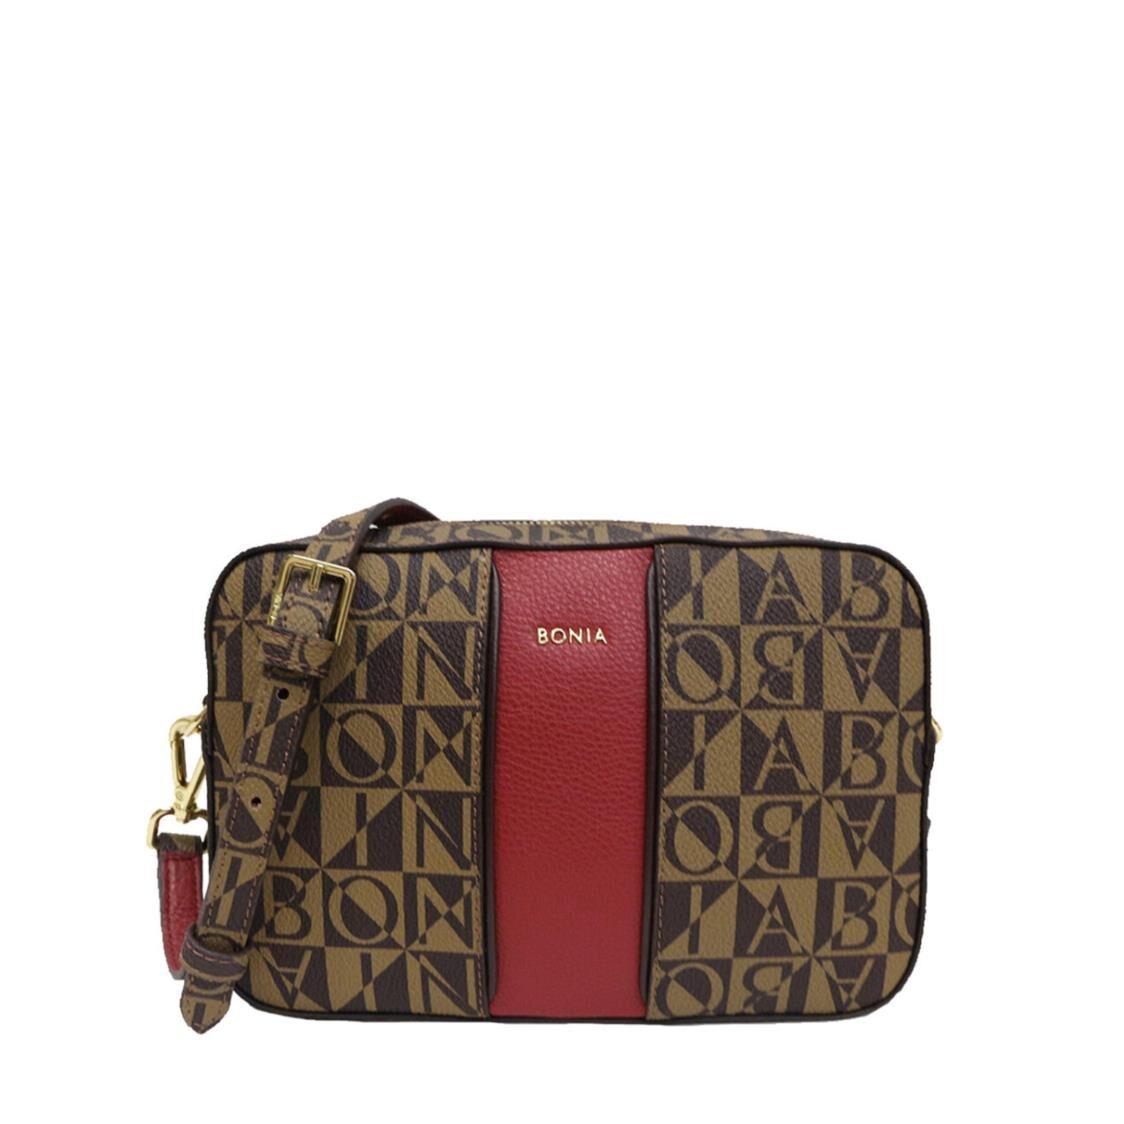 Bonia Monogram Crossbody Bag 801413-001-04